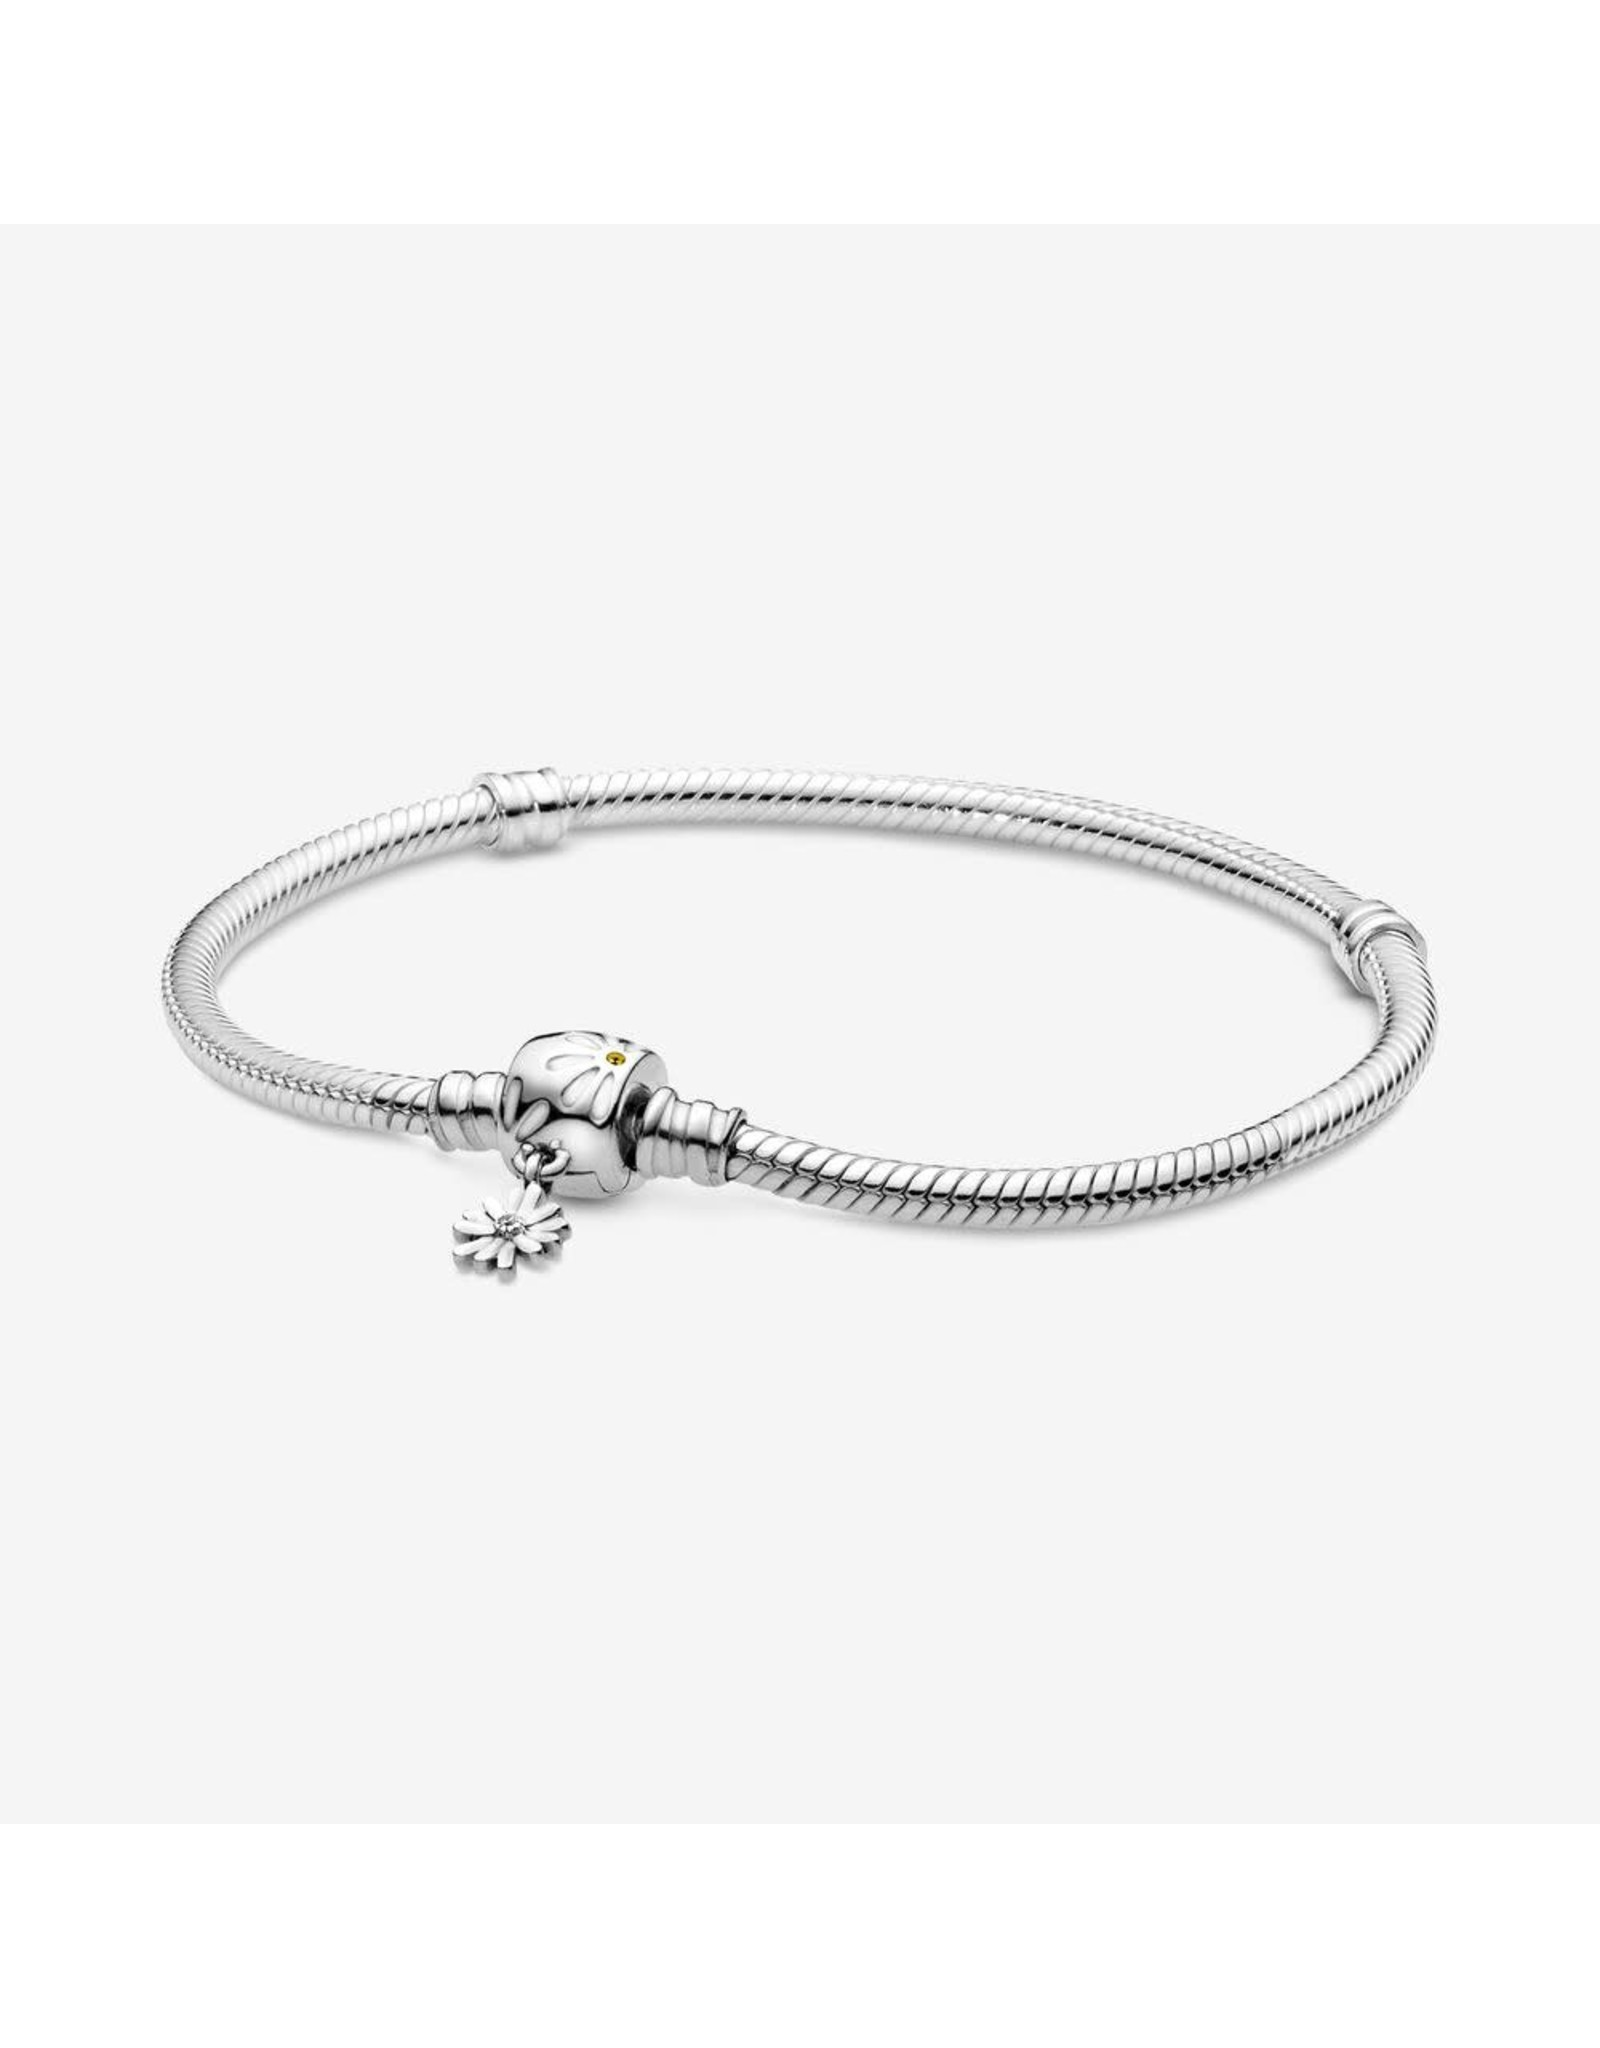 Pandora Pandora Bracelet,598776C01, Daisy Flower Clasp Snack Chain